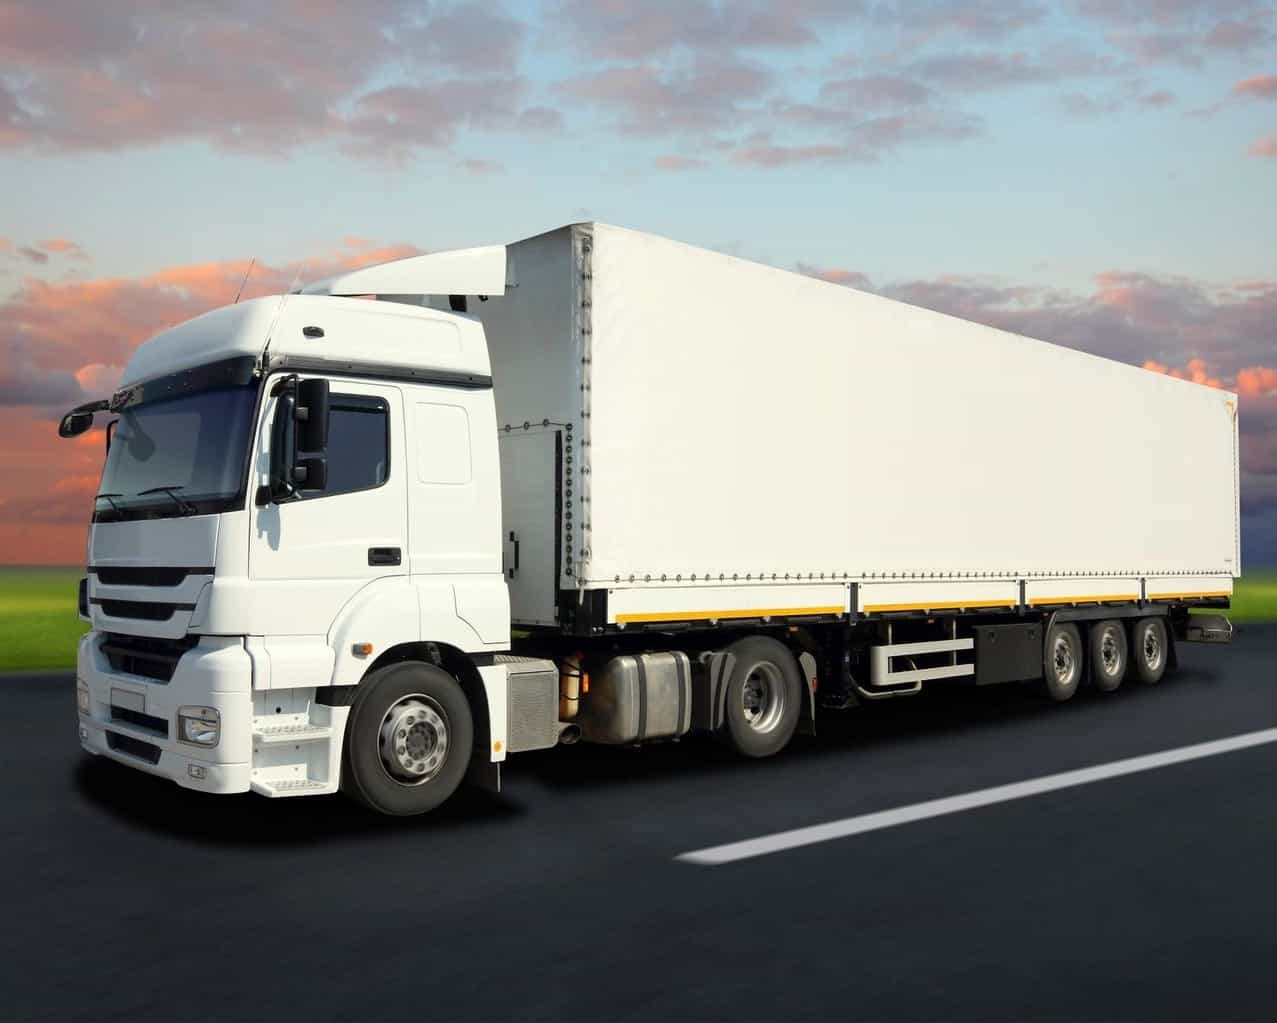 Auto Transport Companies >> Auto Transport Types Of Companies Intercity Lines